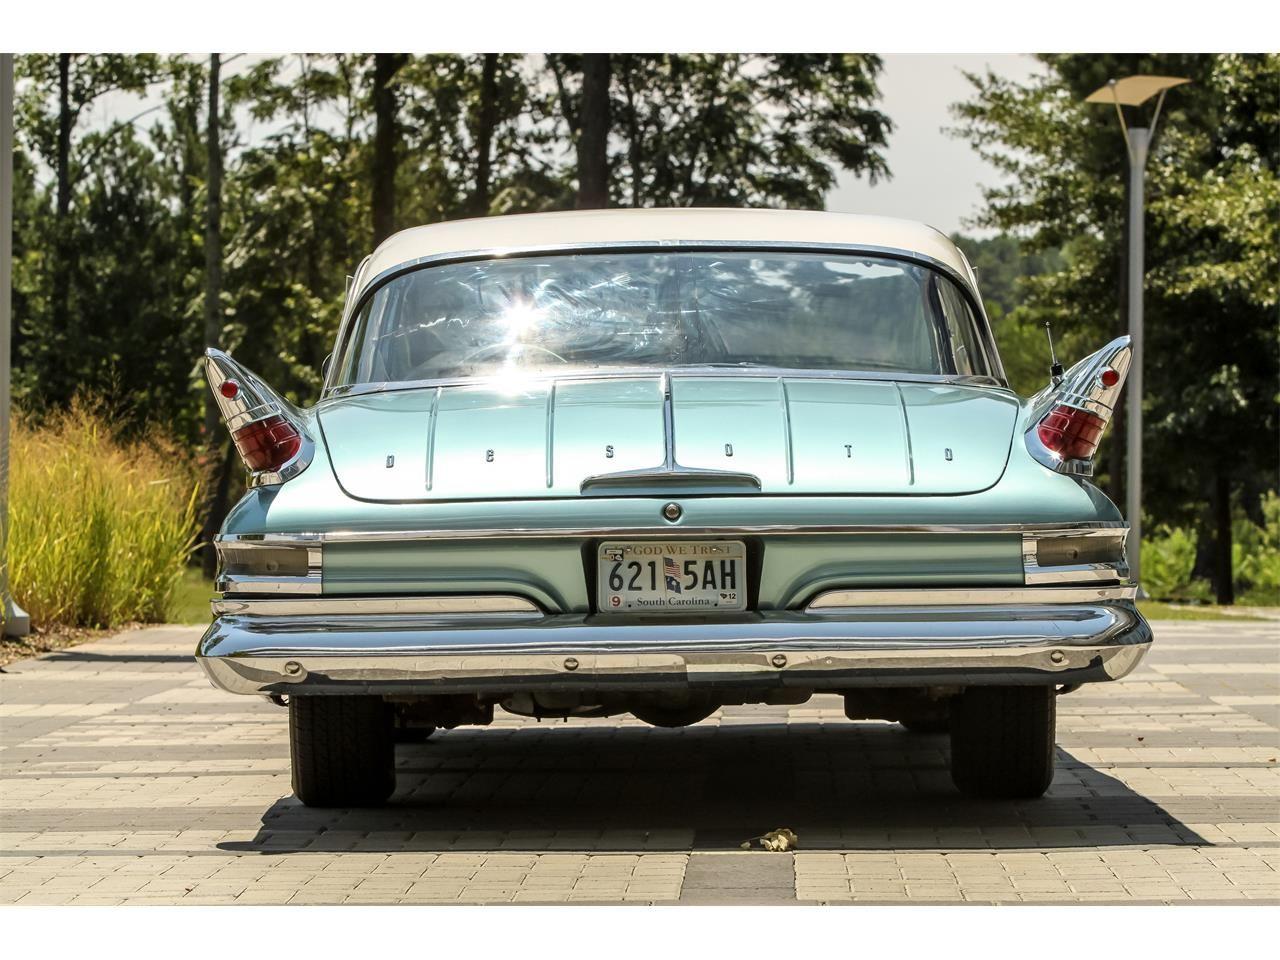 1961 DeSoto   Classic Cars & Trucks   Pinterest   Cars